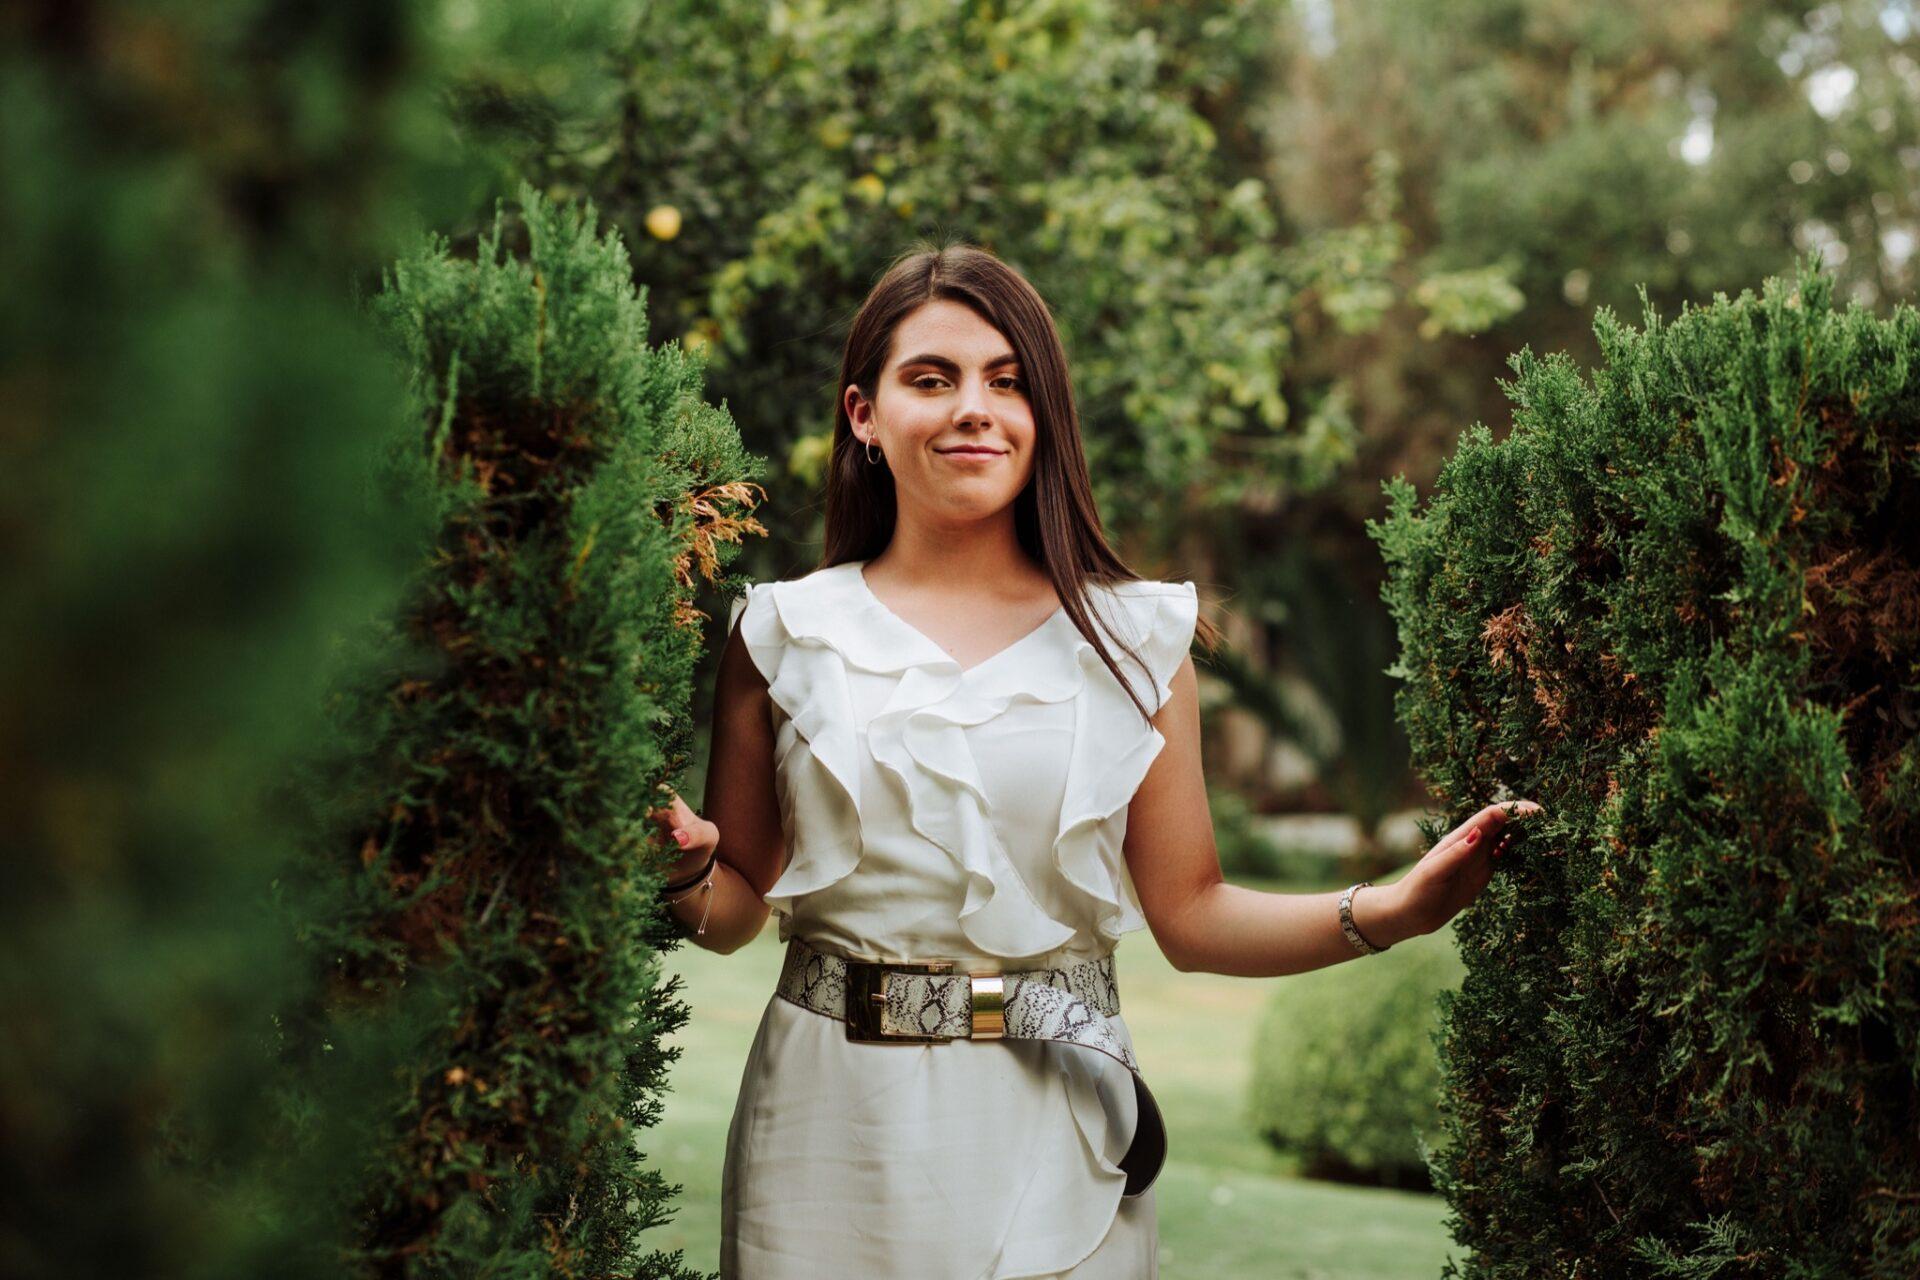 javier_noriega_fotografo_bodas_casual_xv_años_zacatecas_wedding_photographer3